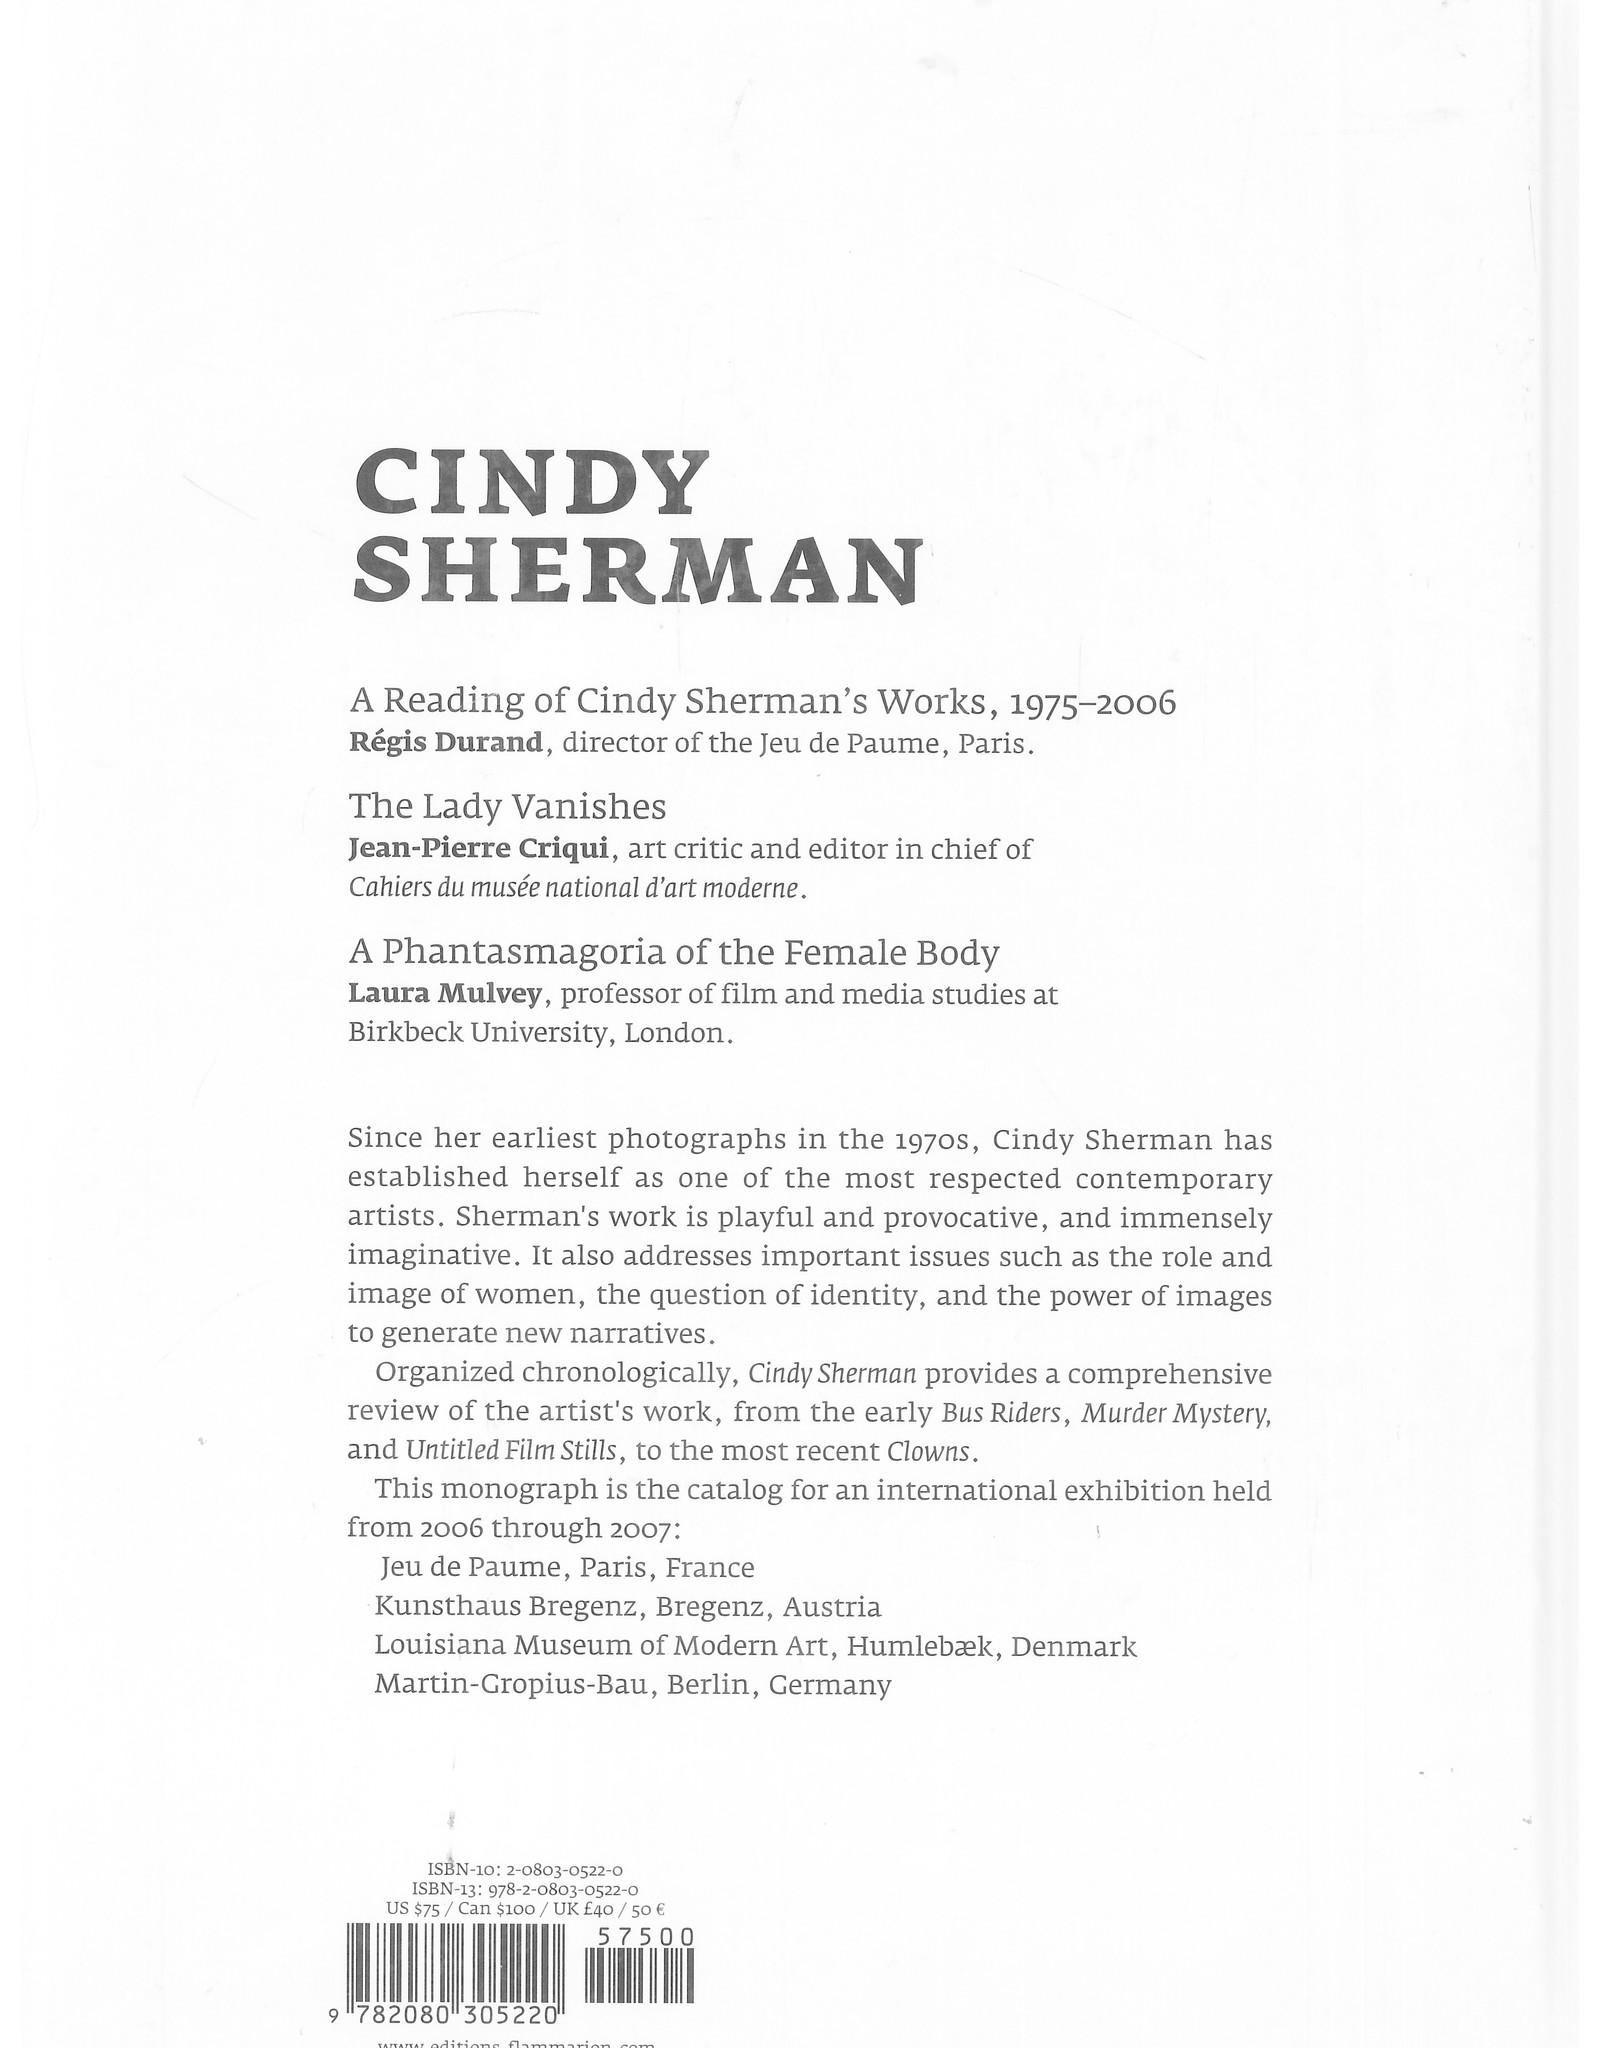 Cindy Sherman / Flammarion-Jue de Paume